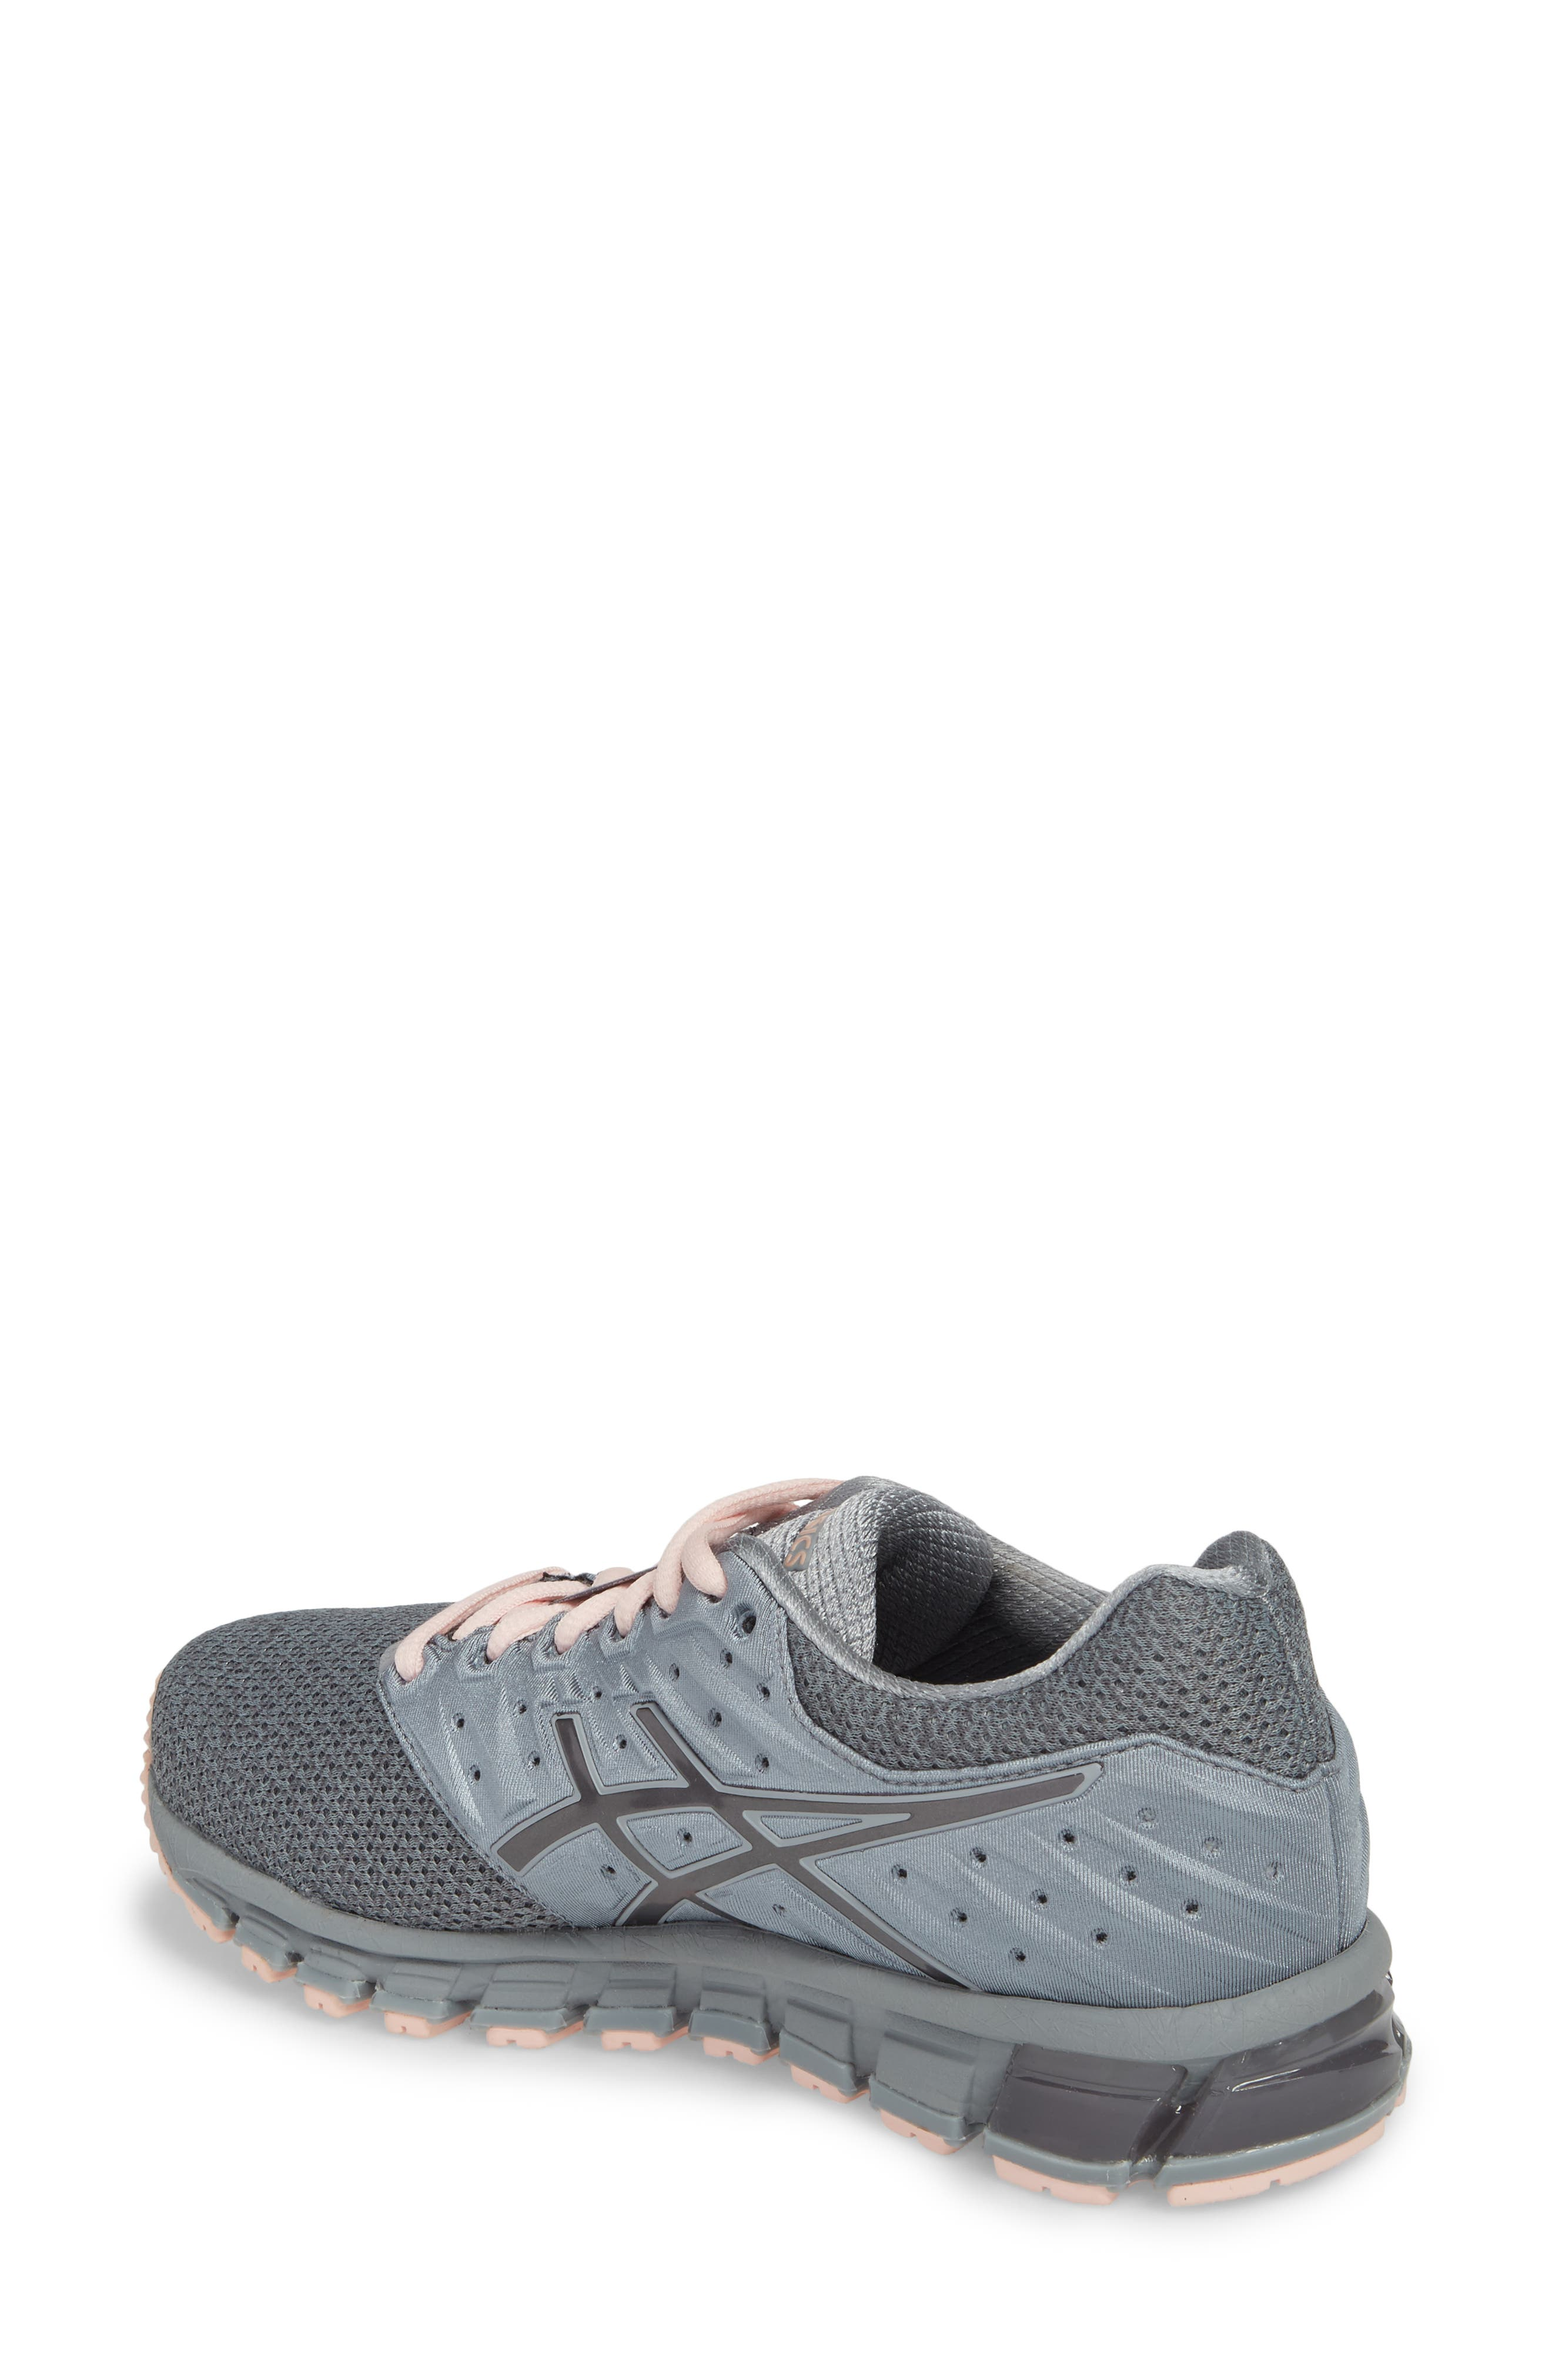 'GEL-Quantum 180 2' Running Shoe,                             Alternate thumbnail 2, color,                             Stone Grey/ Carbon/ Pink